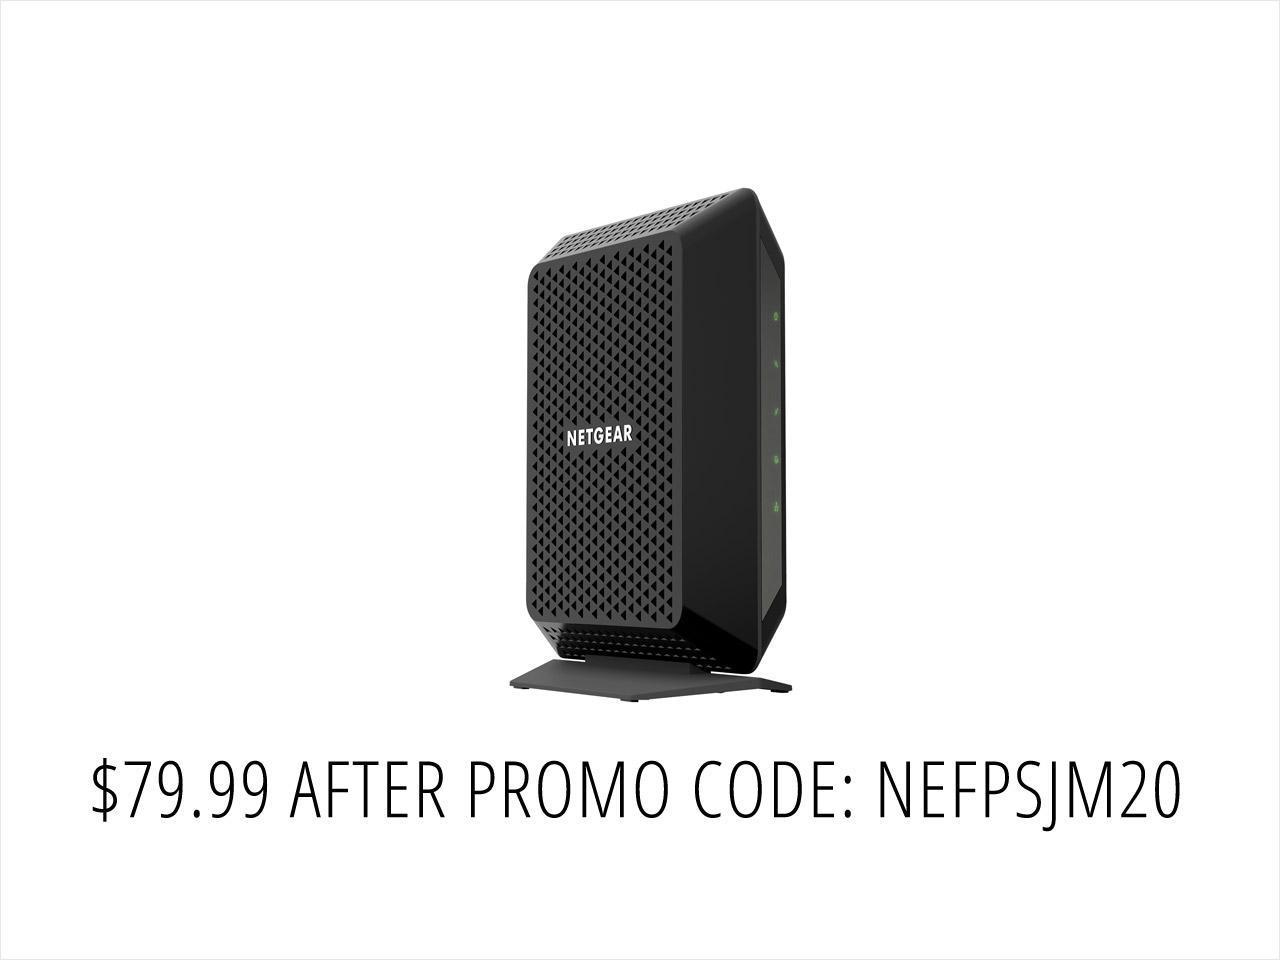 NETGEAR CM700 32x8 1.4Gbps DOCSIS 3.0 High Speed Cable Modem $80 AC@NF